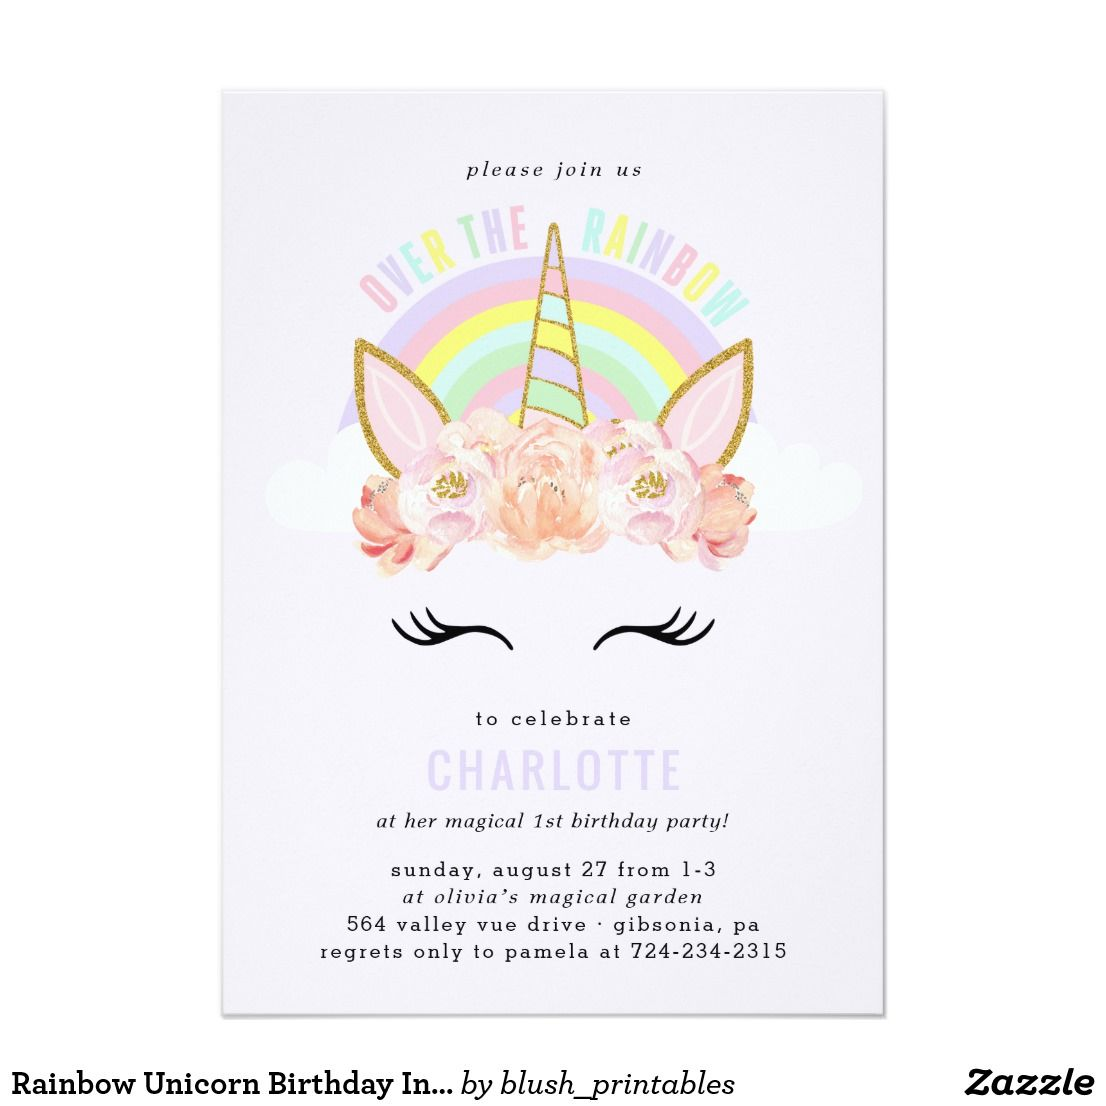 Rainbow Unicorn Birthday Invitation Pink Gold | Pinterest | Unicorn ...